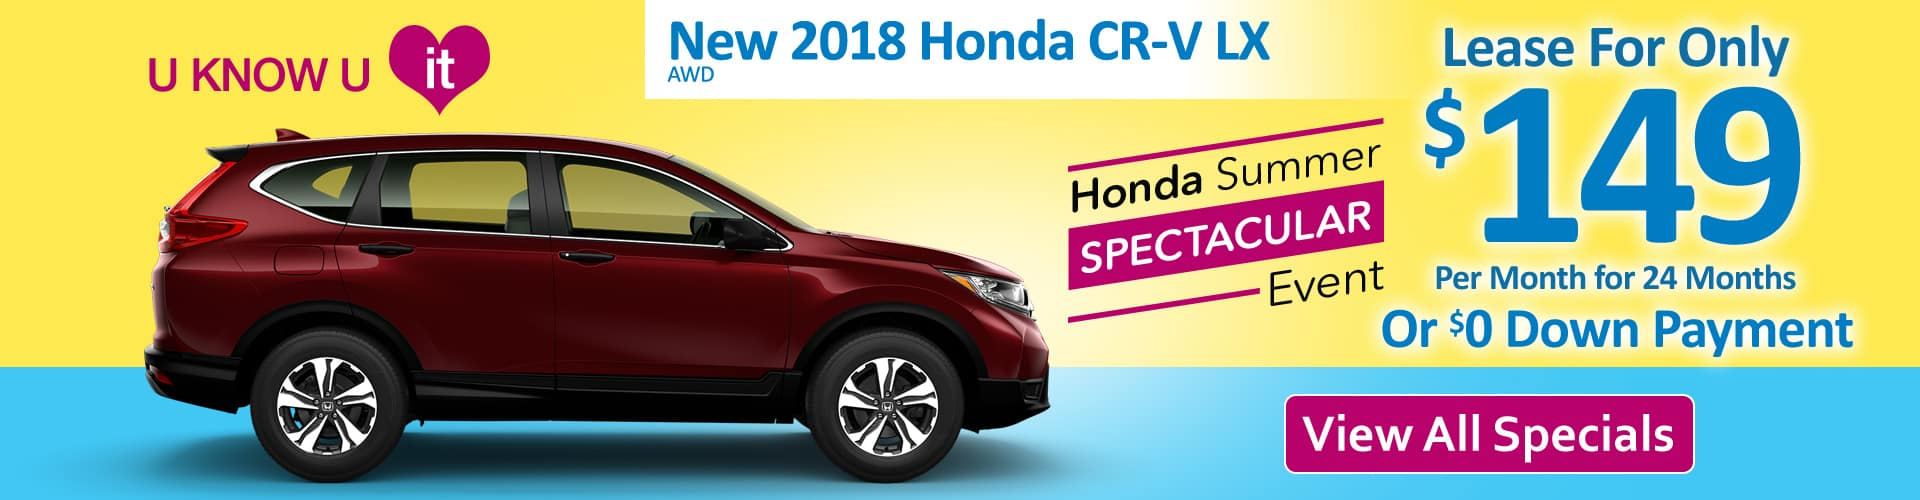 Peters Honda of Nashua | Honda Dealer in Nashua, NH